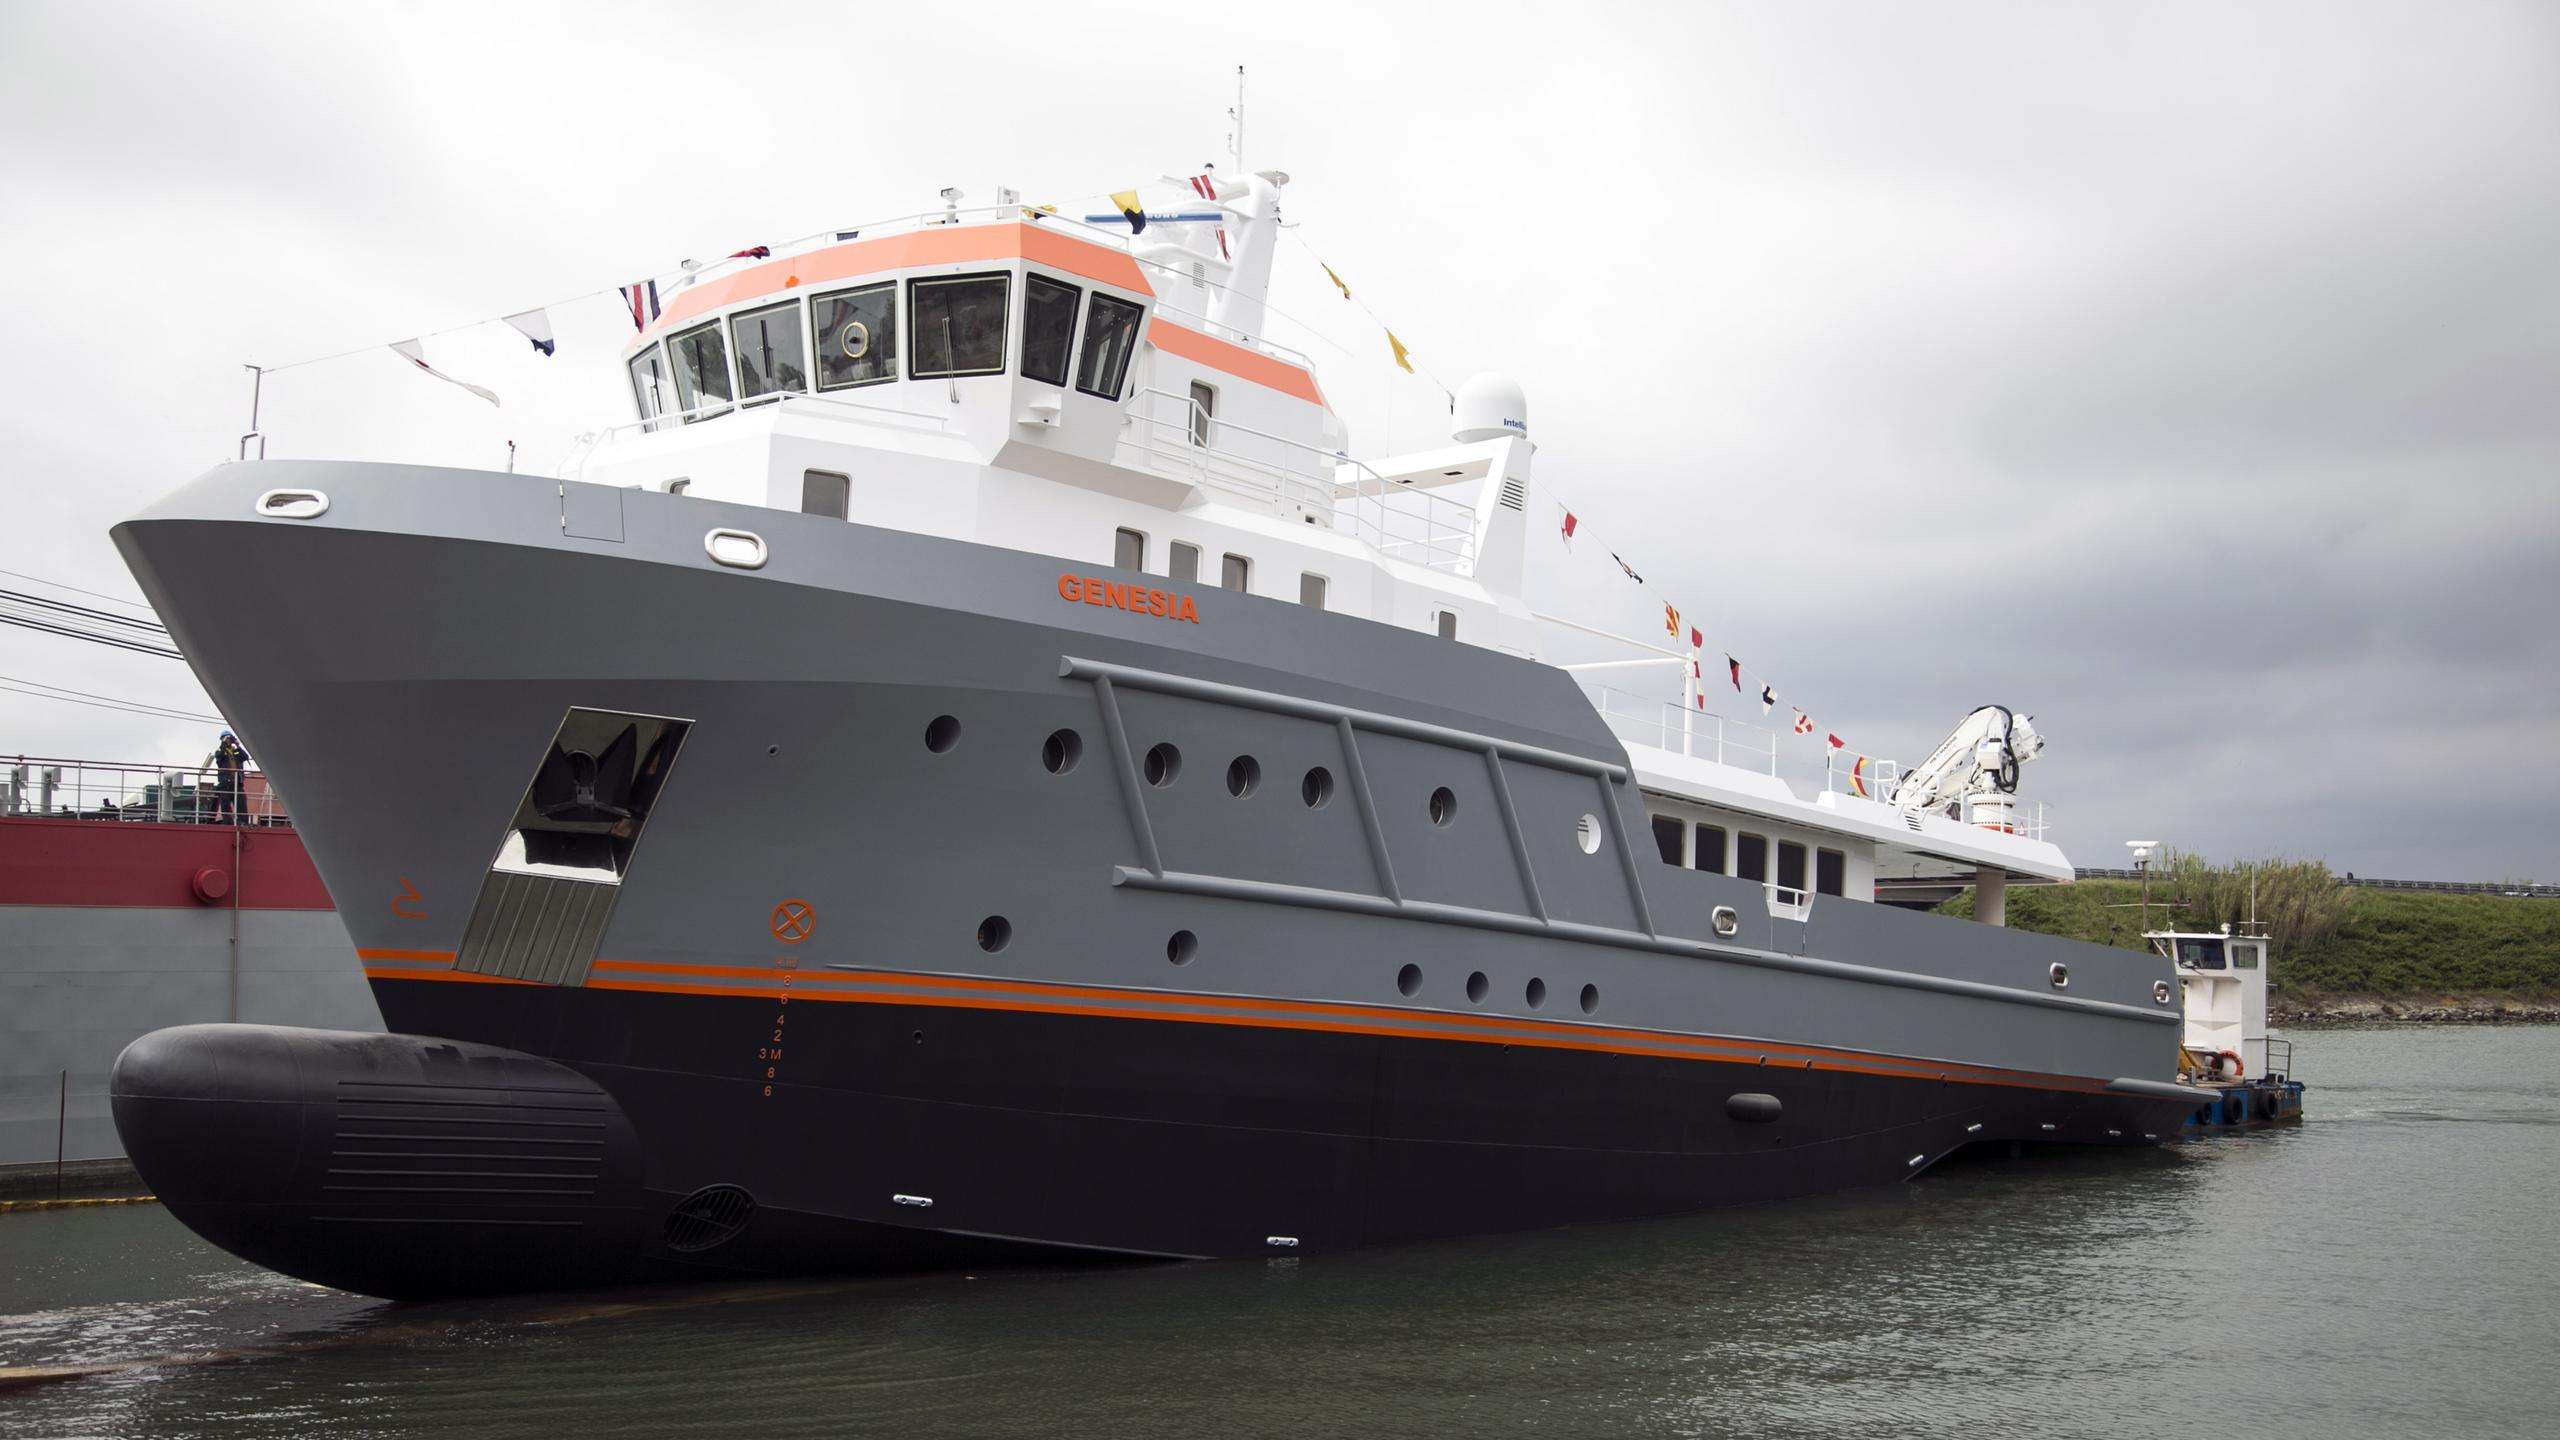 genesia motoryacht chioggia ocean king 130 yacht 40m 2017 launch half profile